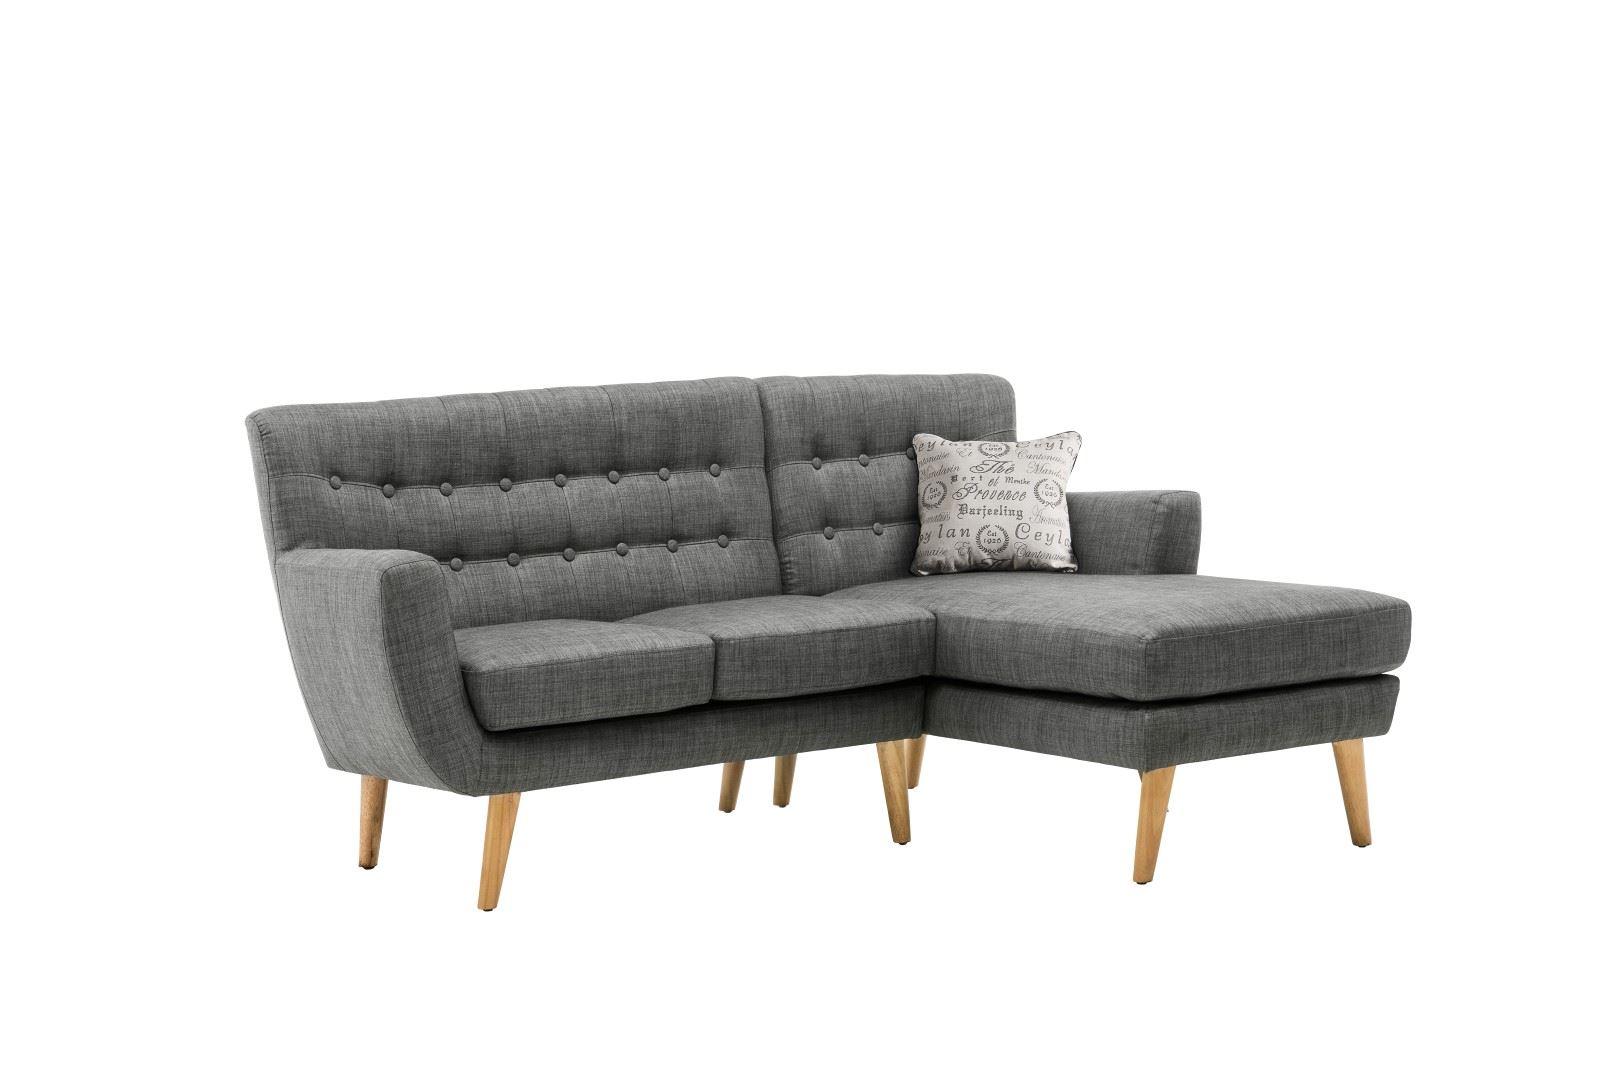 Retro Sofa Feet